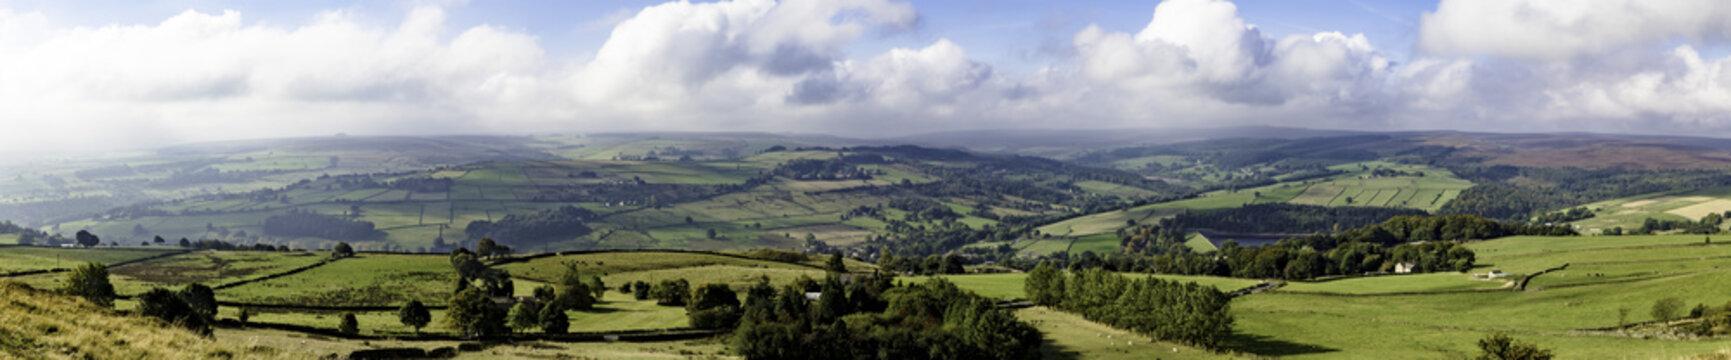 Panorama of Yorkshire countryside